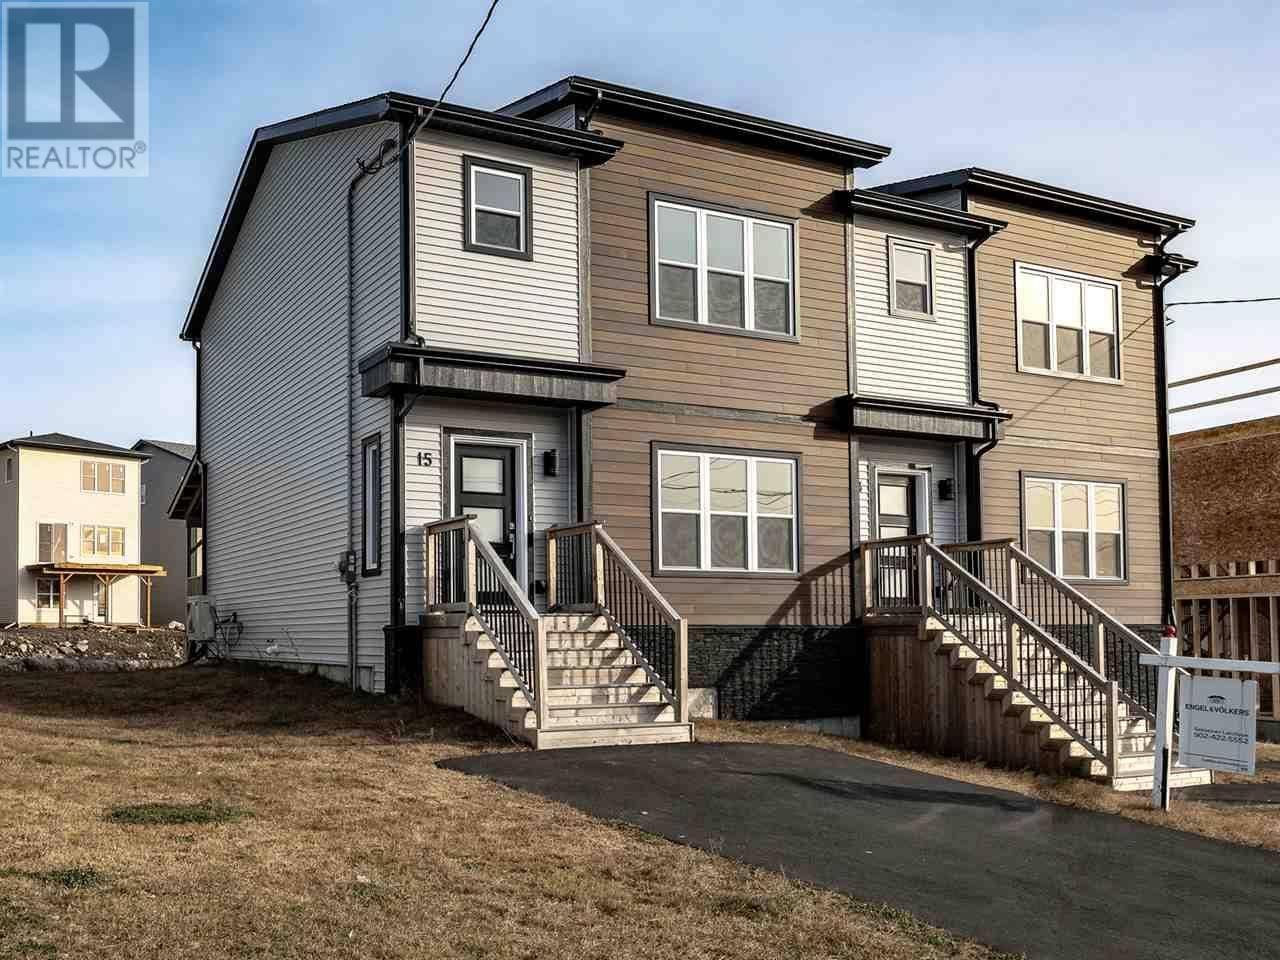 House for sale at 13 Travertine Ct Halifax Nova Scotia - MLS: 201809132